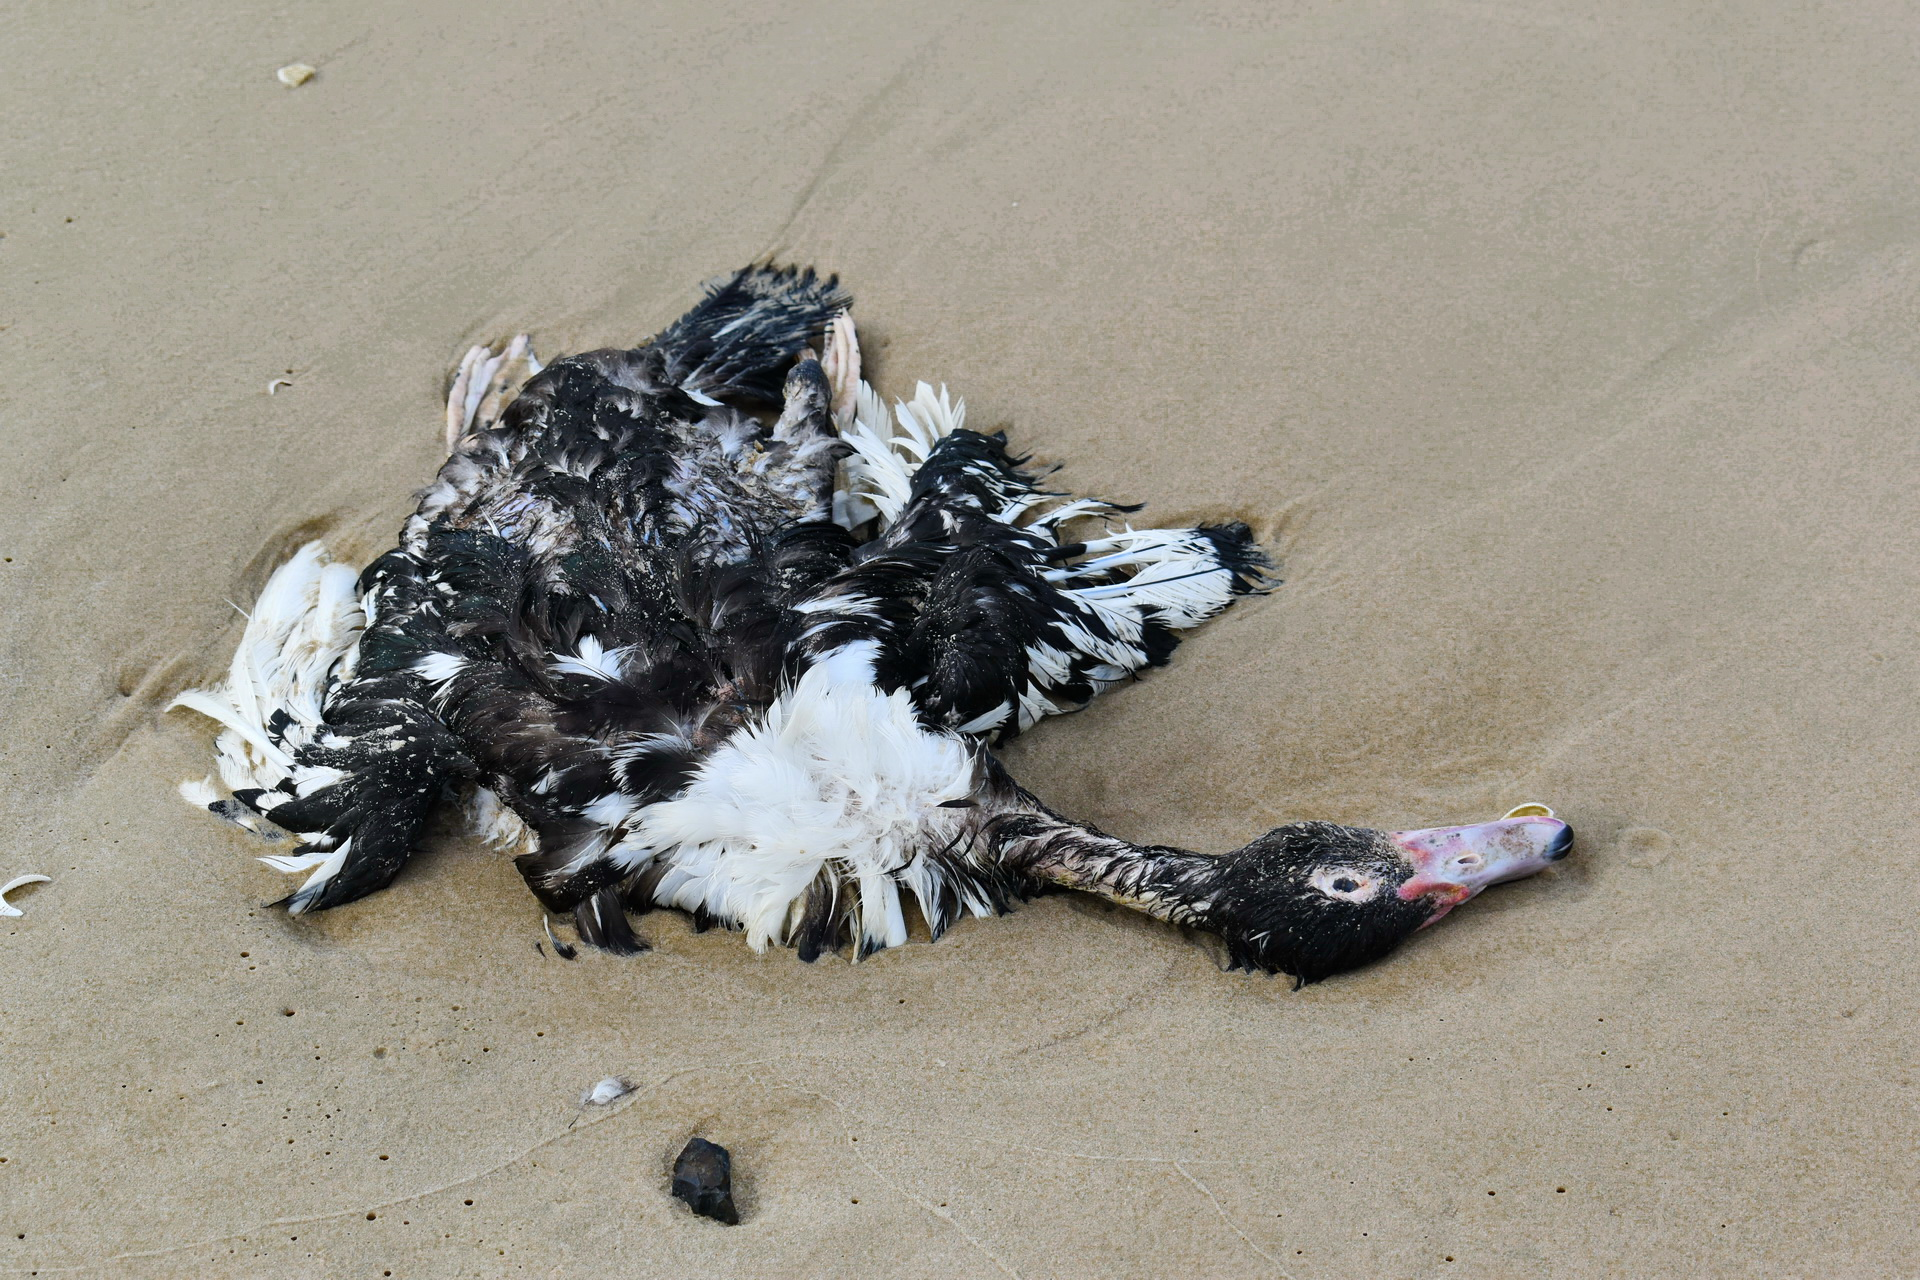 A dead bird washes up on shore at the Ke Ga Beach in Binh Thuan Province, Vietnam. Photo: Tuan Son / Tuoi Tre News